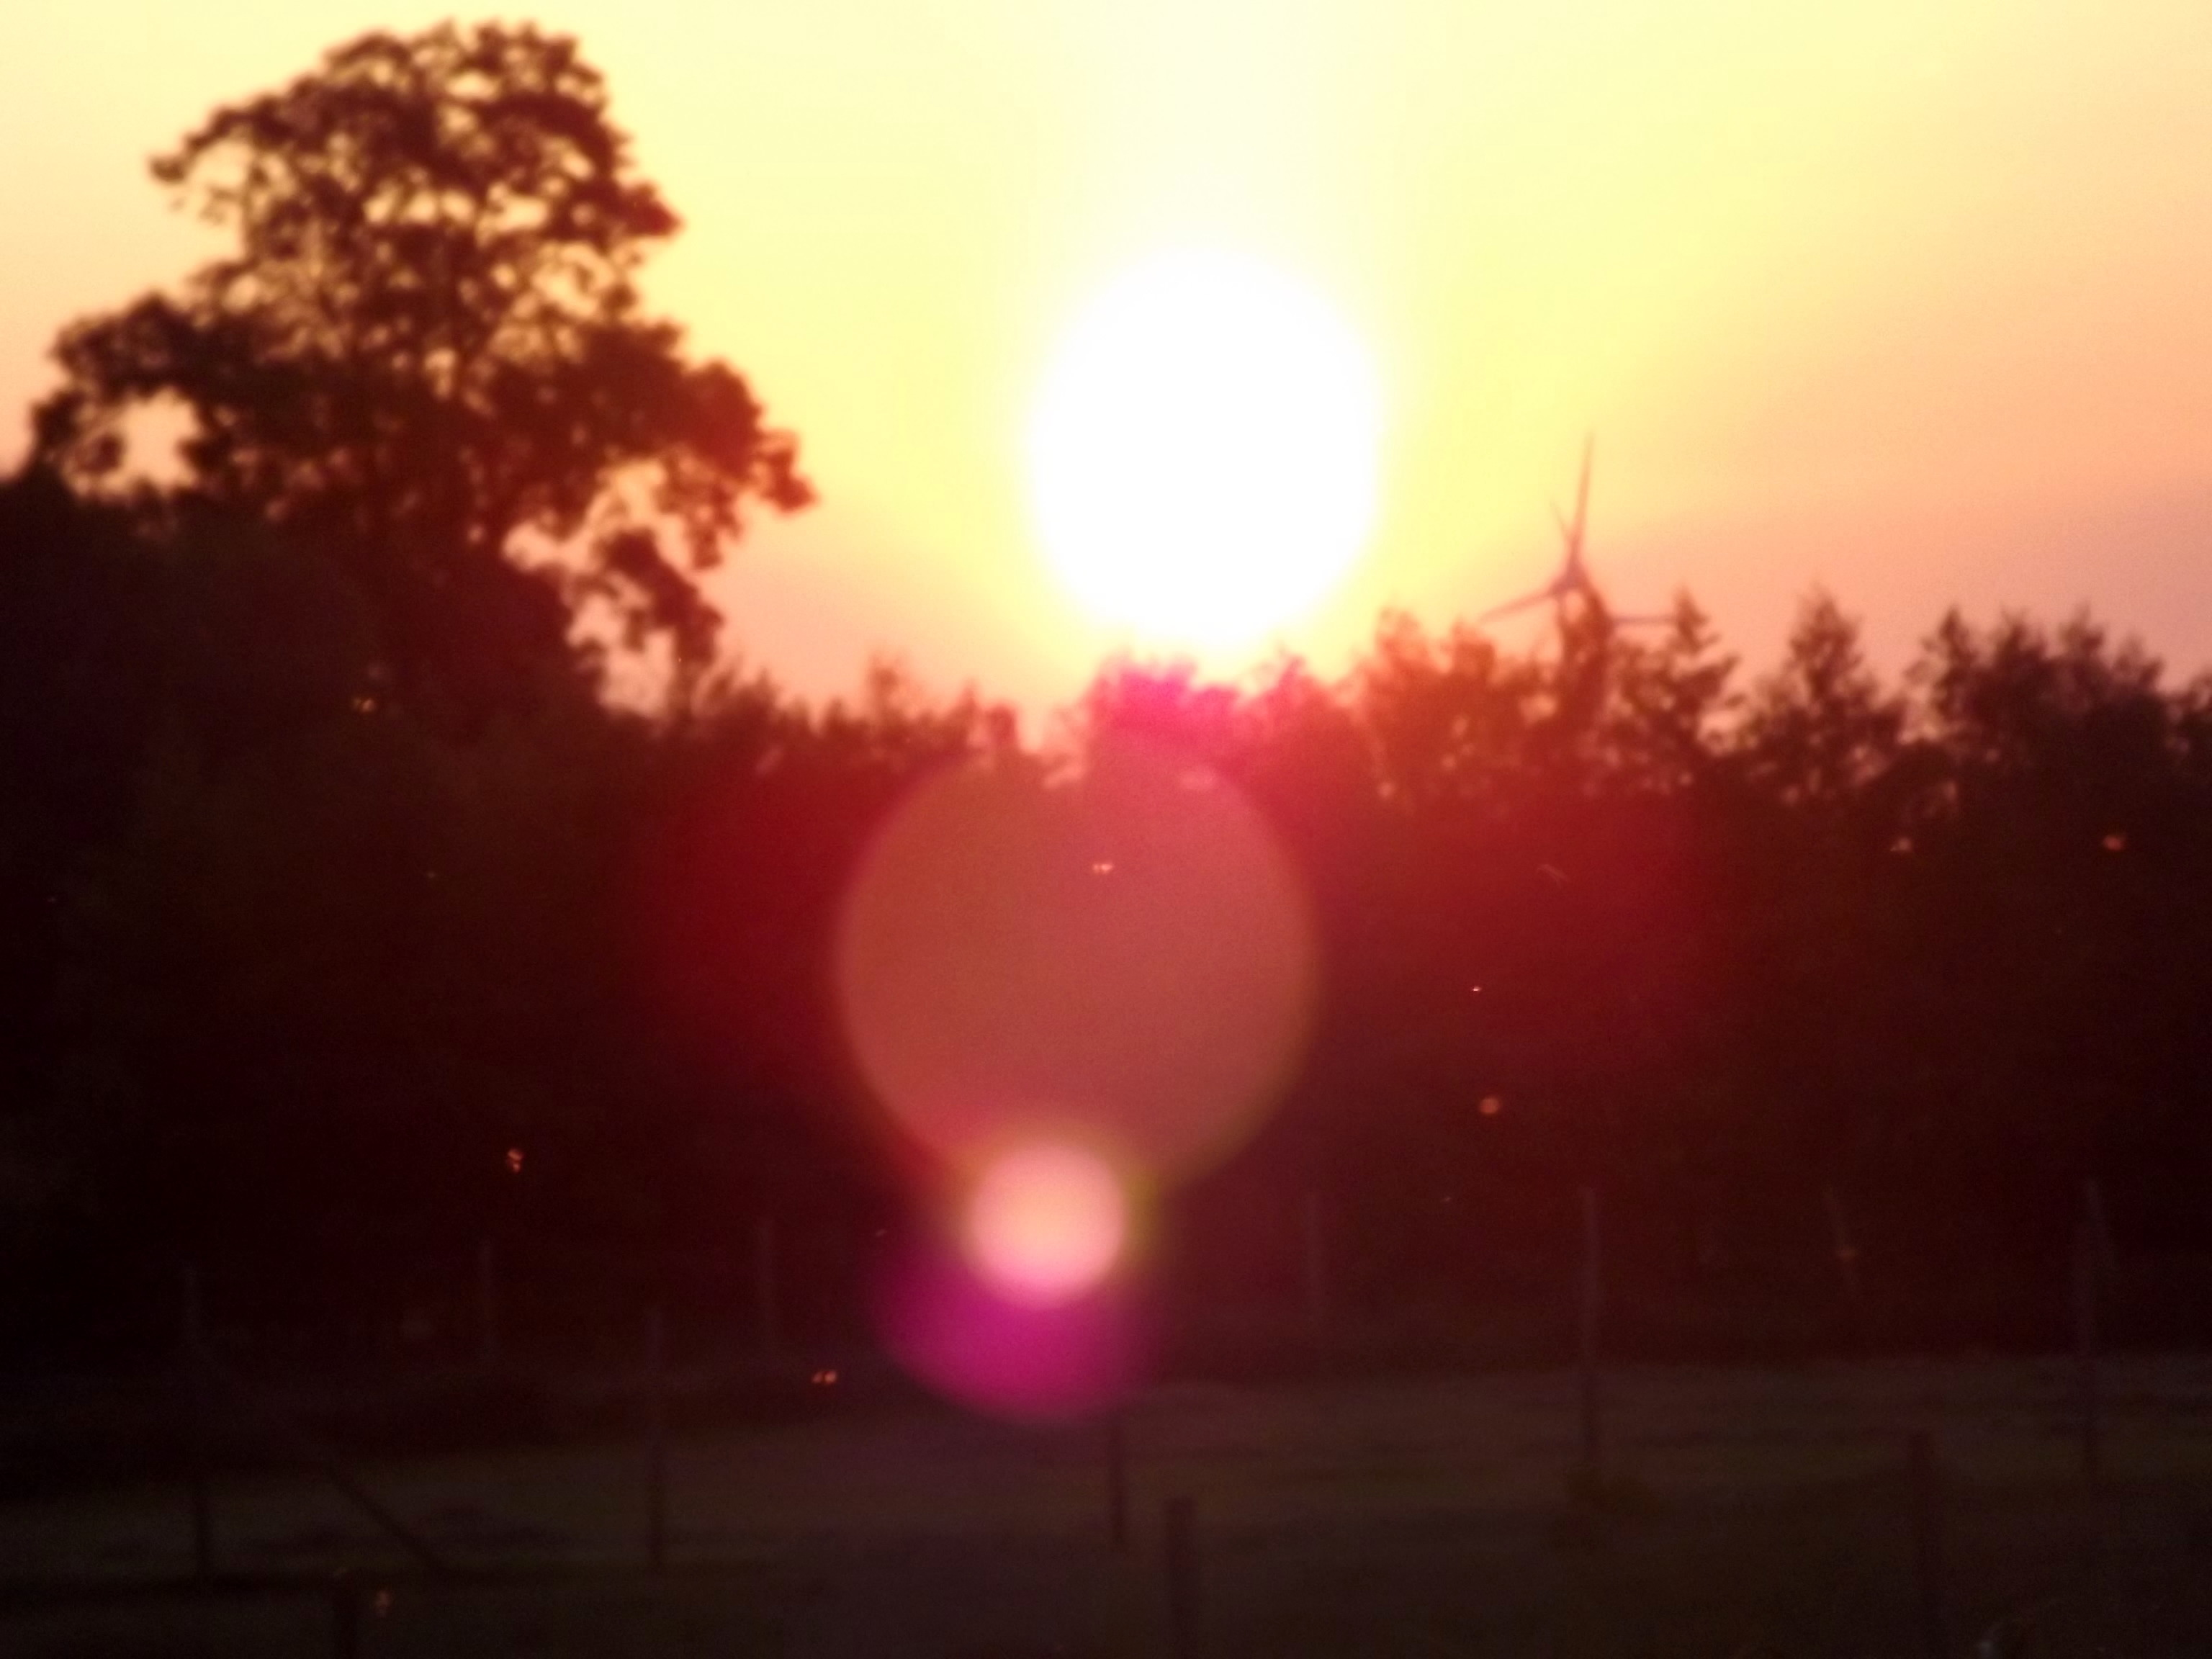 6242-sonnenaufgang-sonnenuntergang-wald-himmel-lensflare